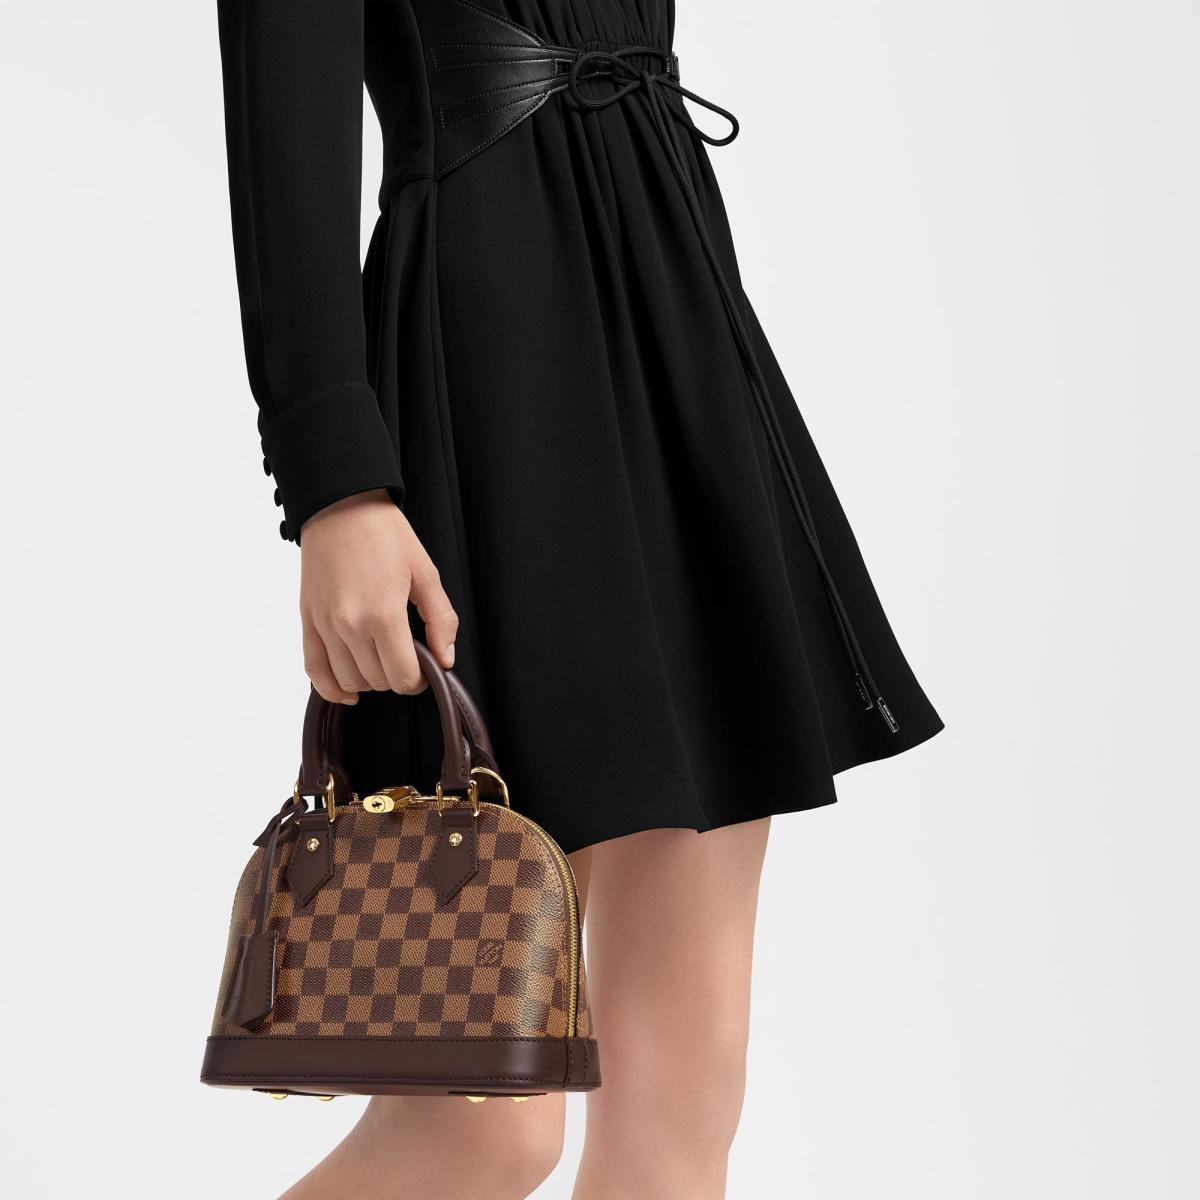 Louis Vuitton Alma in Damier Ebene BB size